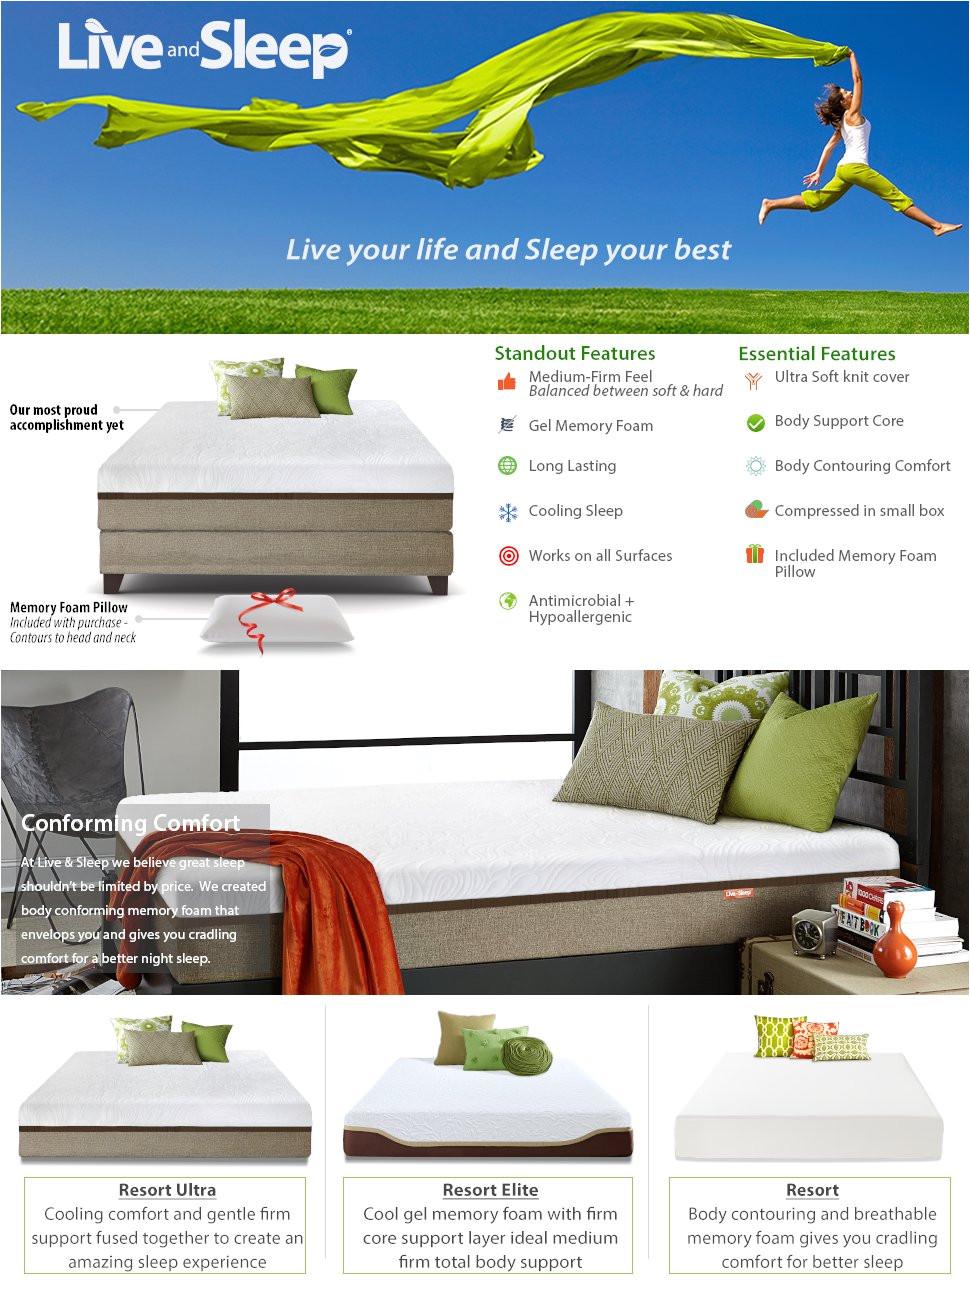 live and sleep resort ultra 12 inch gel infused memory foam mattress